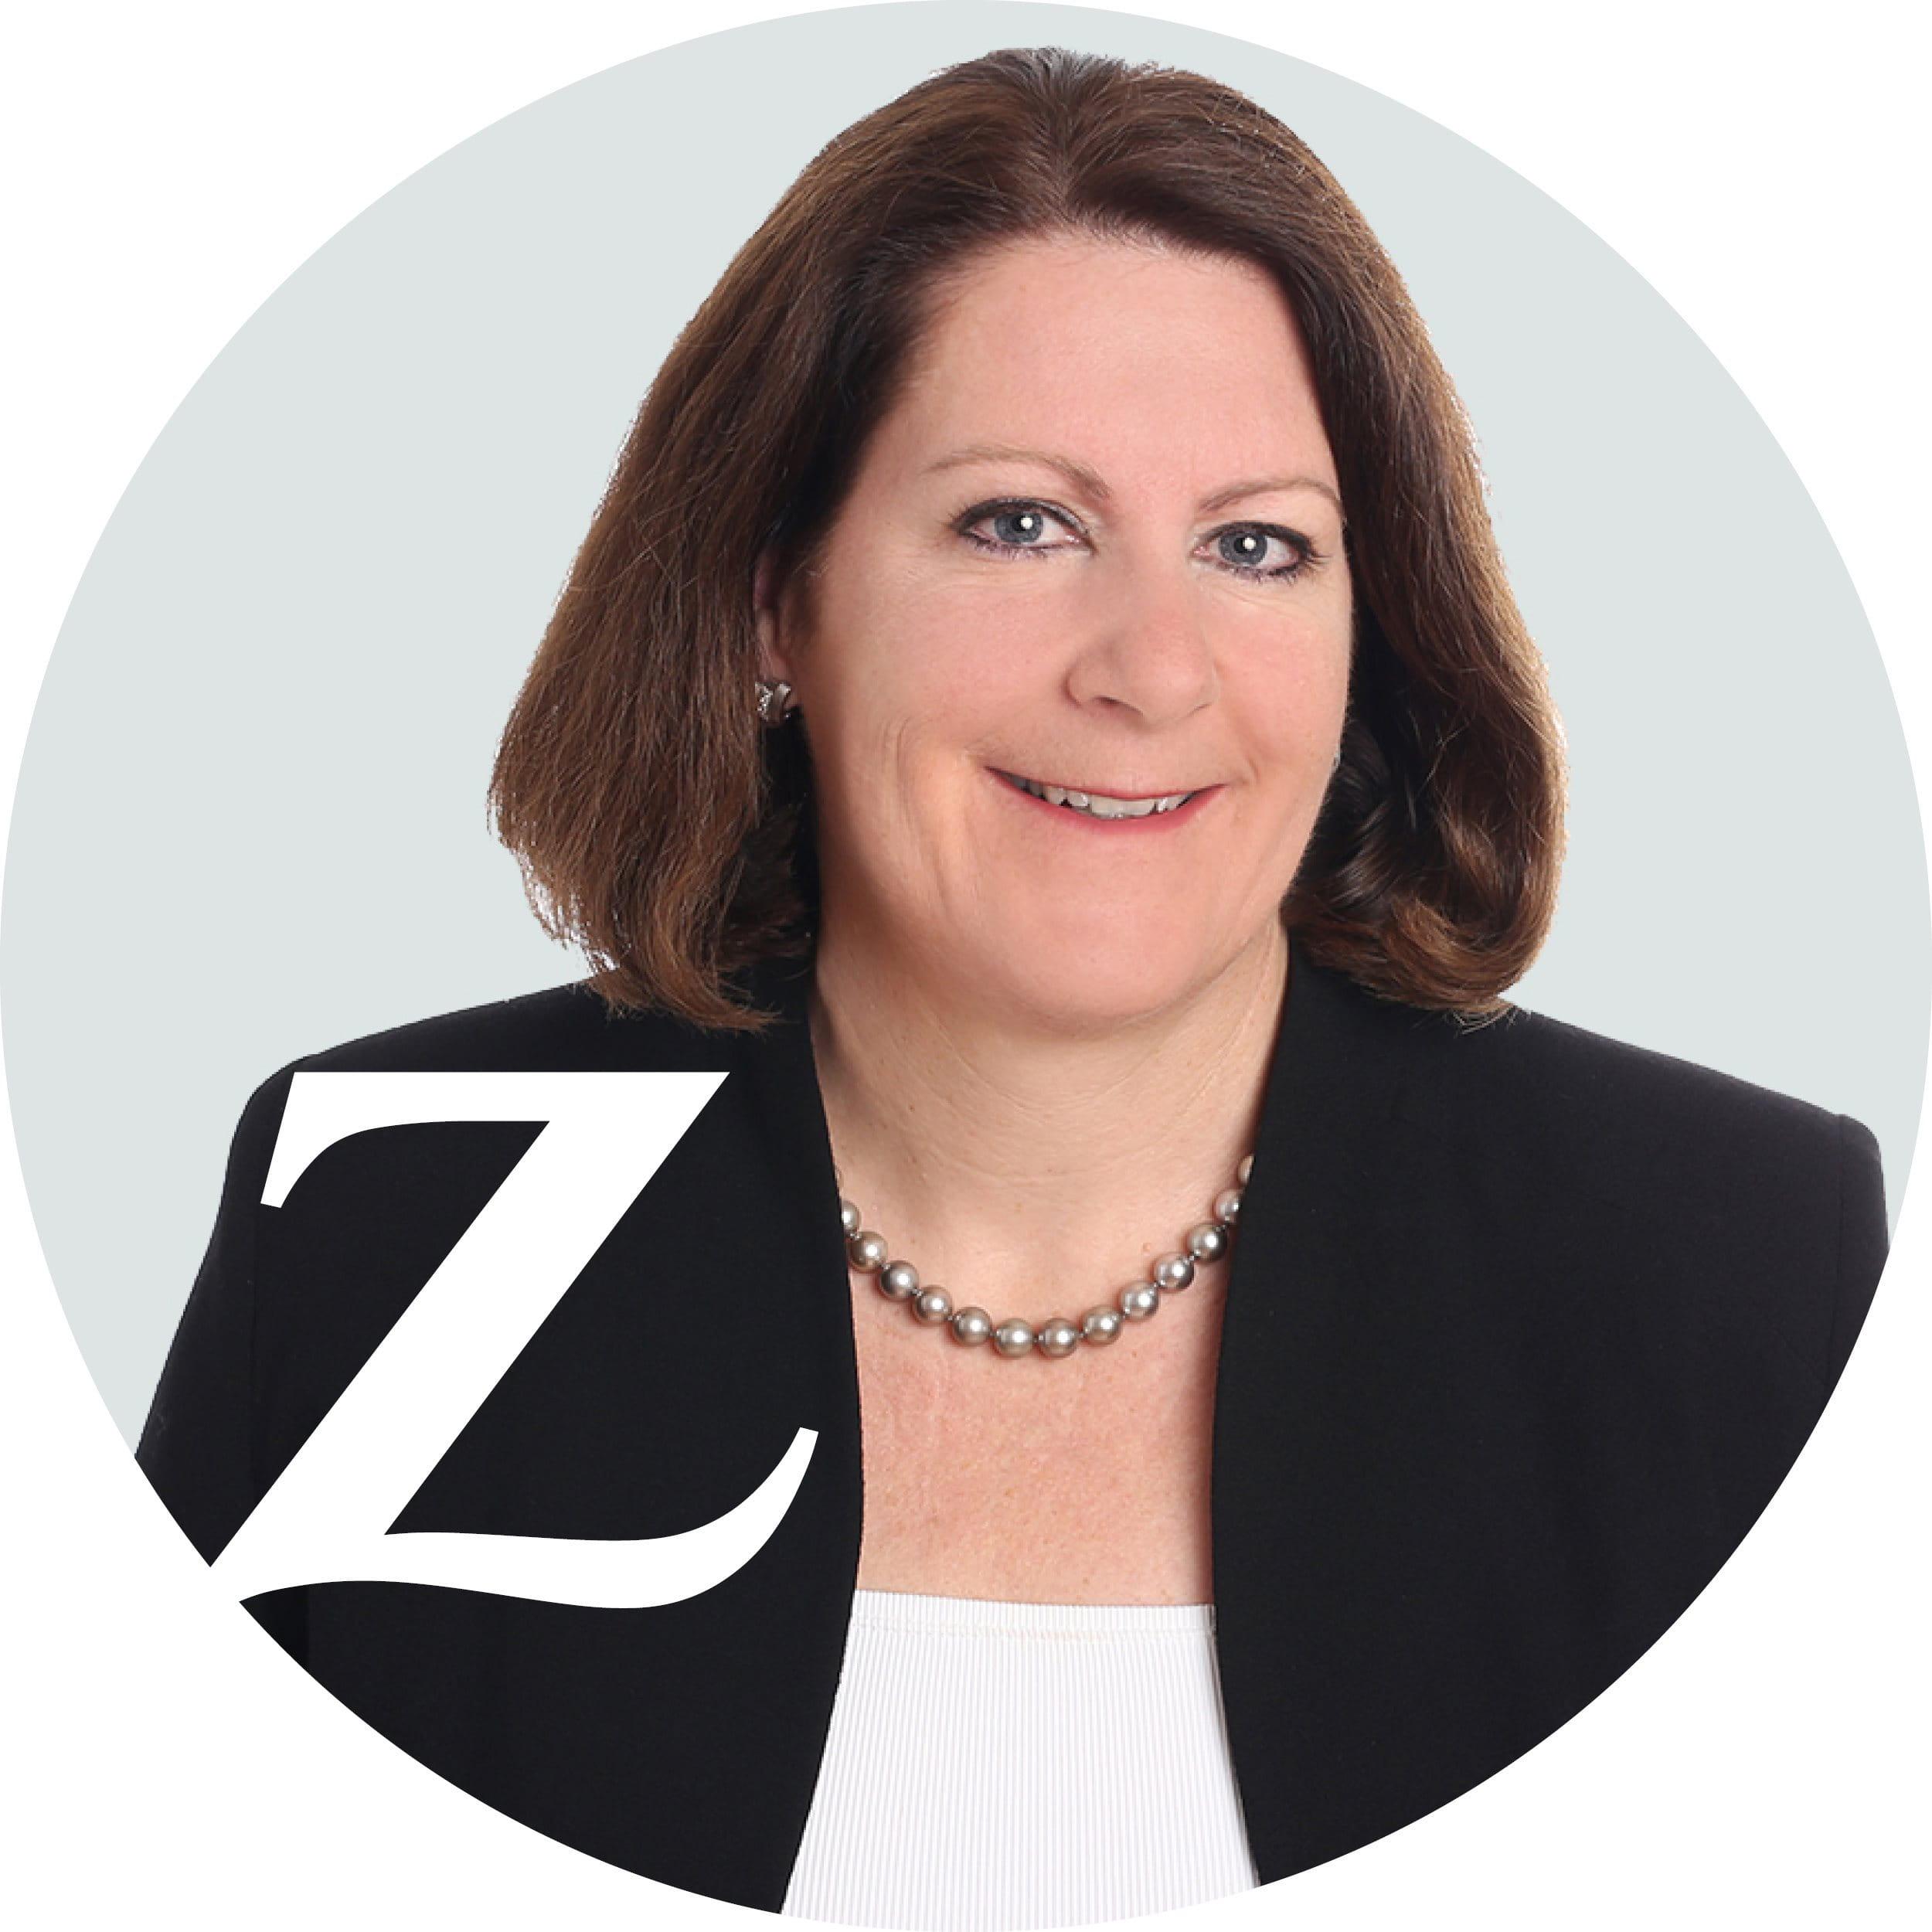 Sandra Hauser, Head of Transformation & Technology